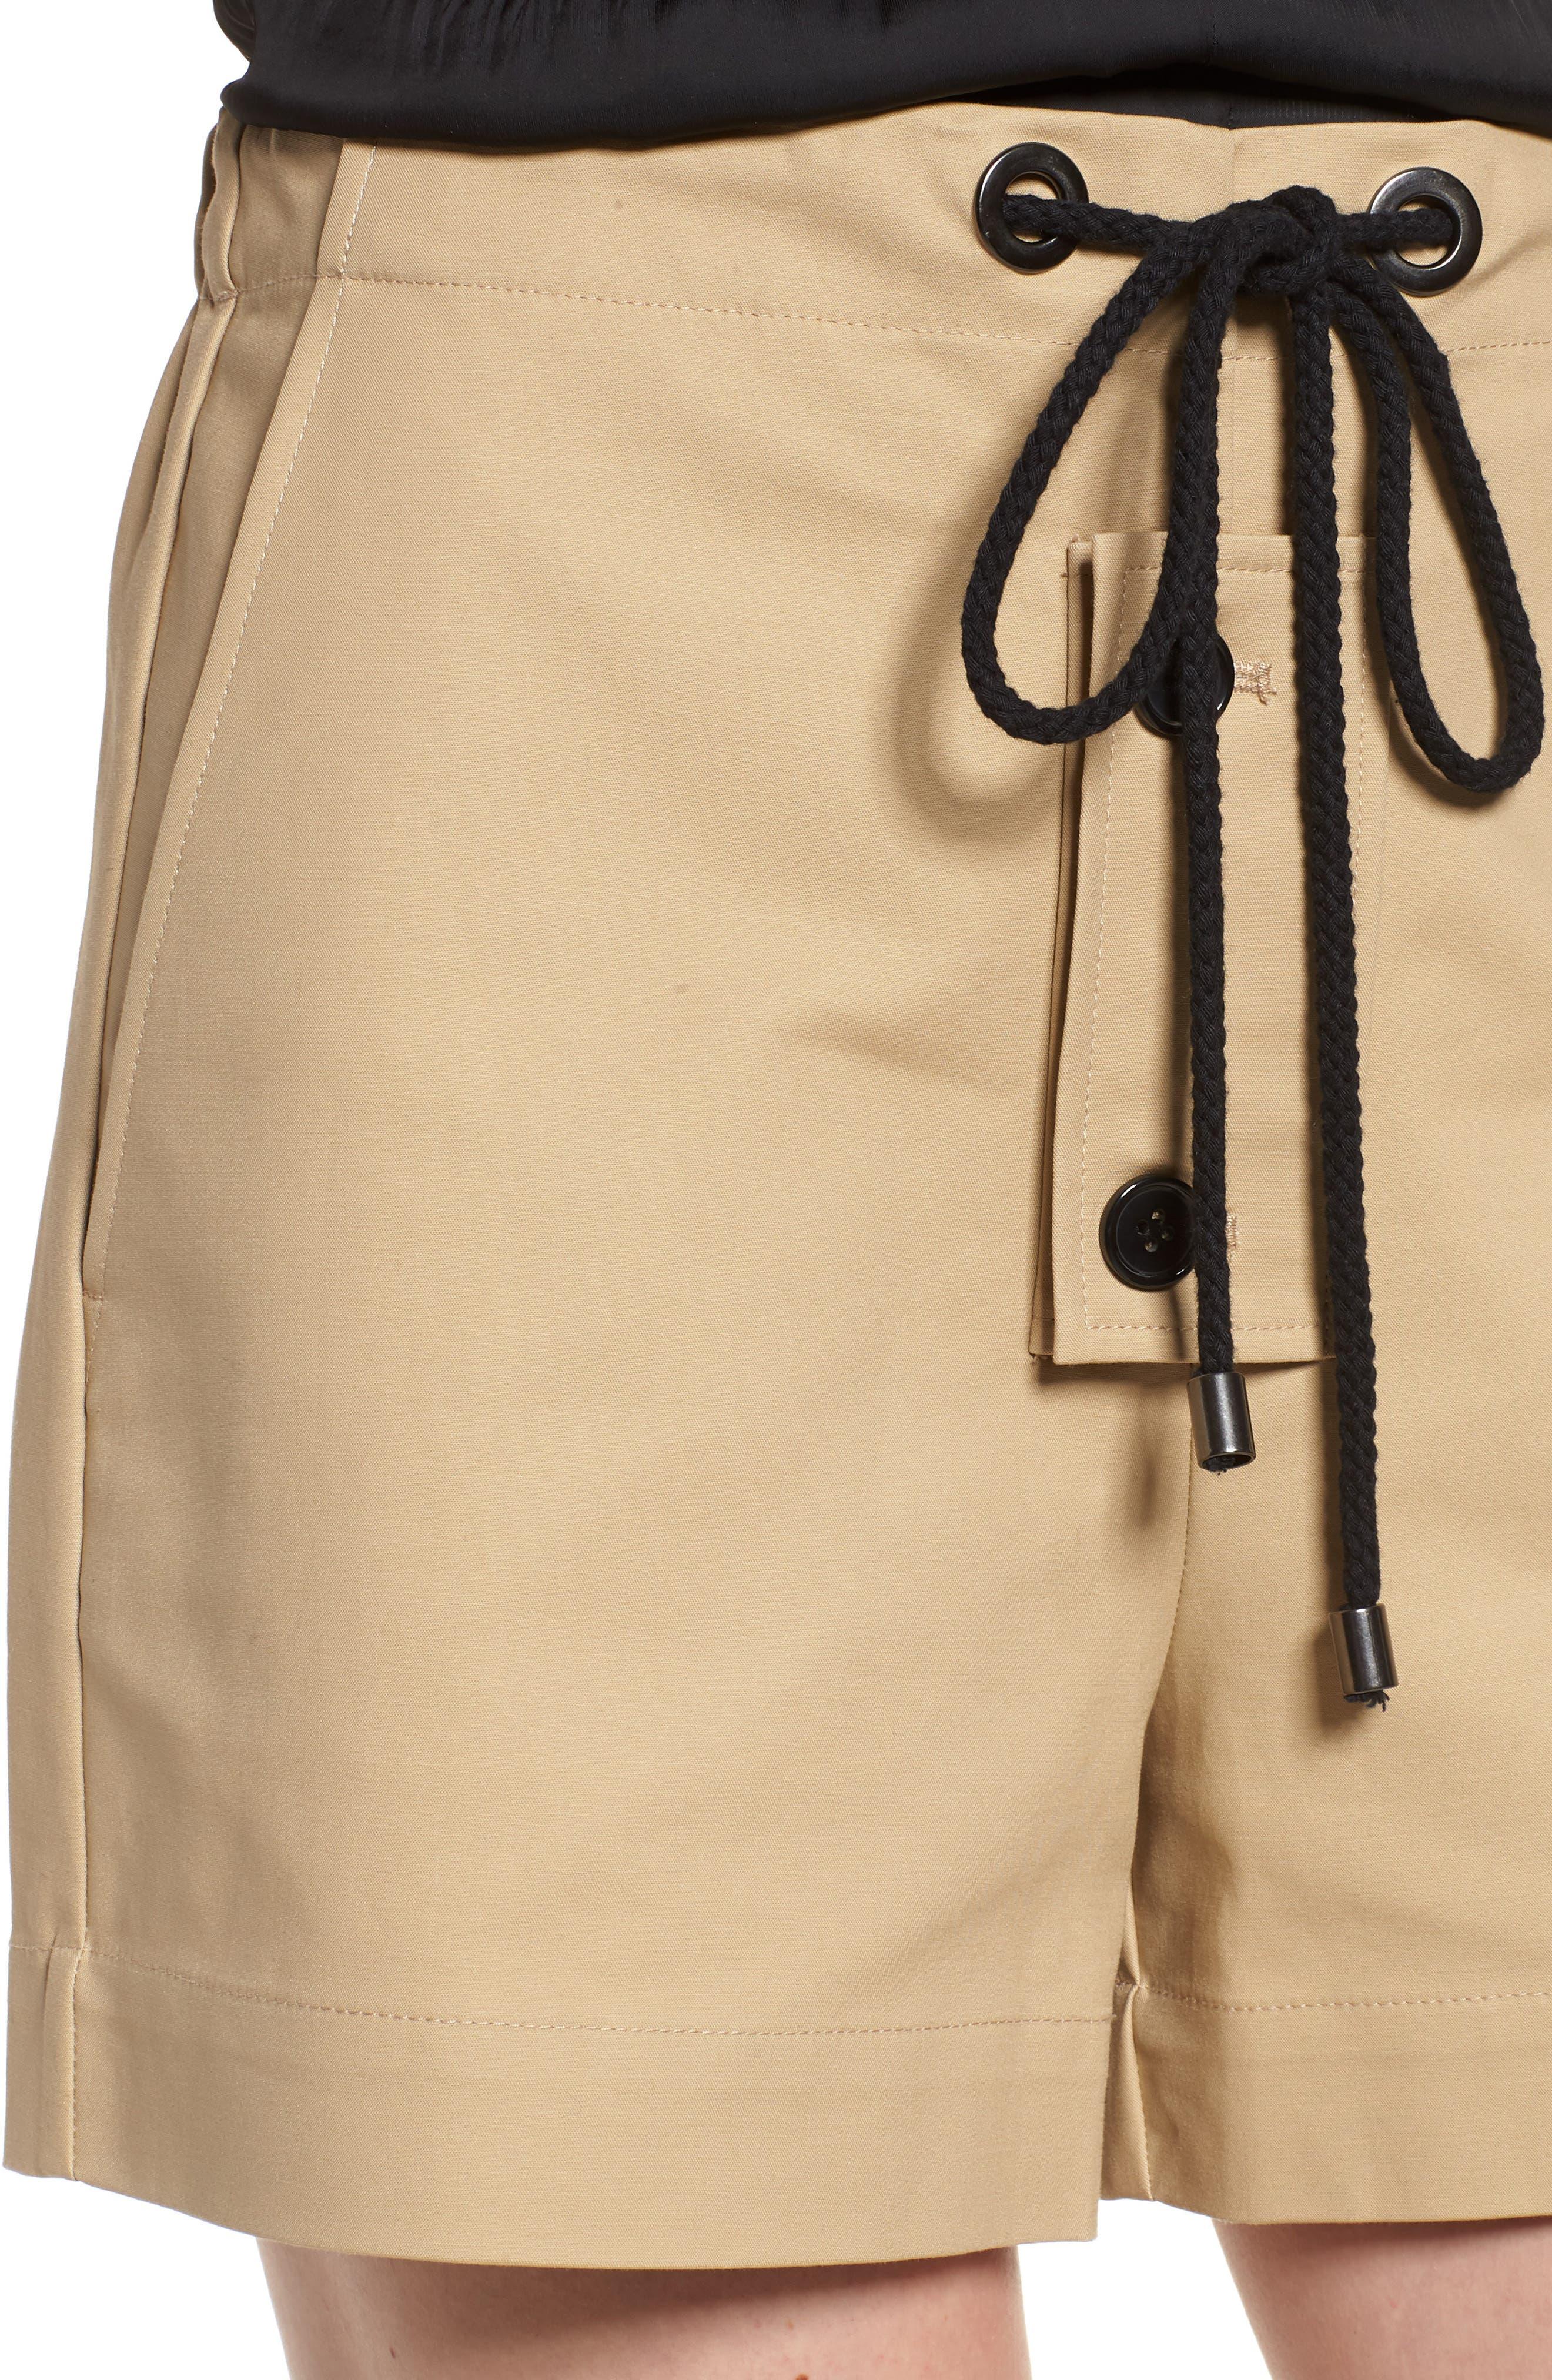 Park South Shorts,                             Alternate thumbnail 4, color,                             250